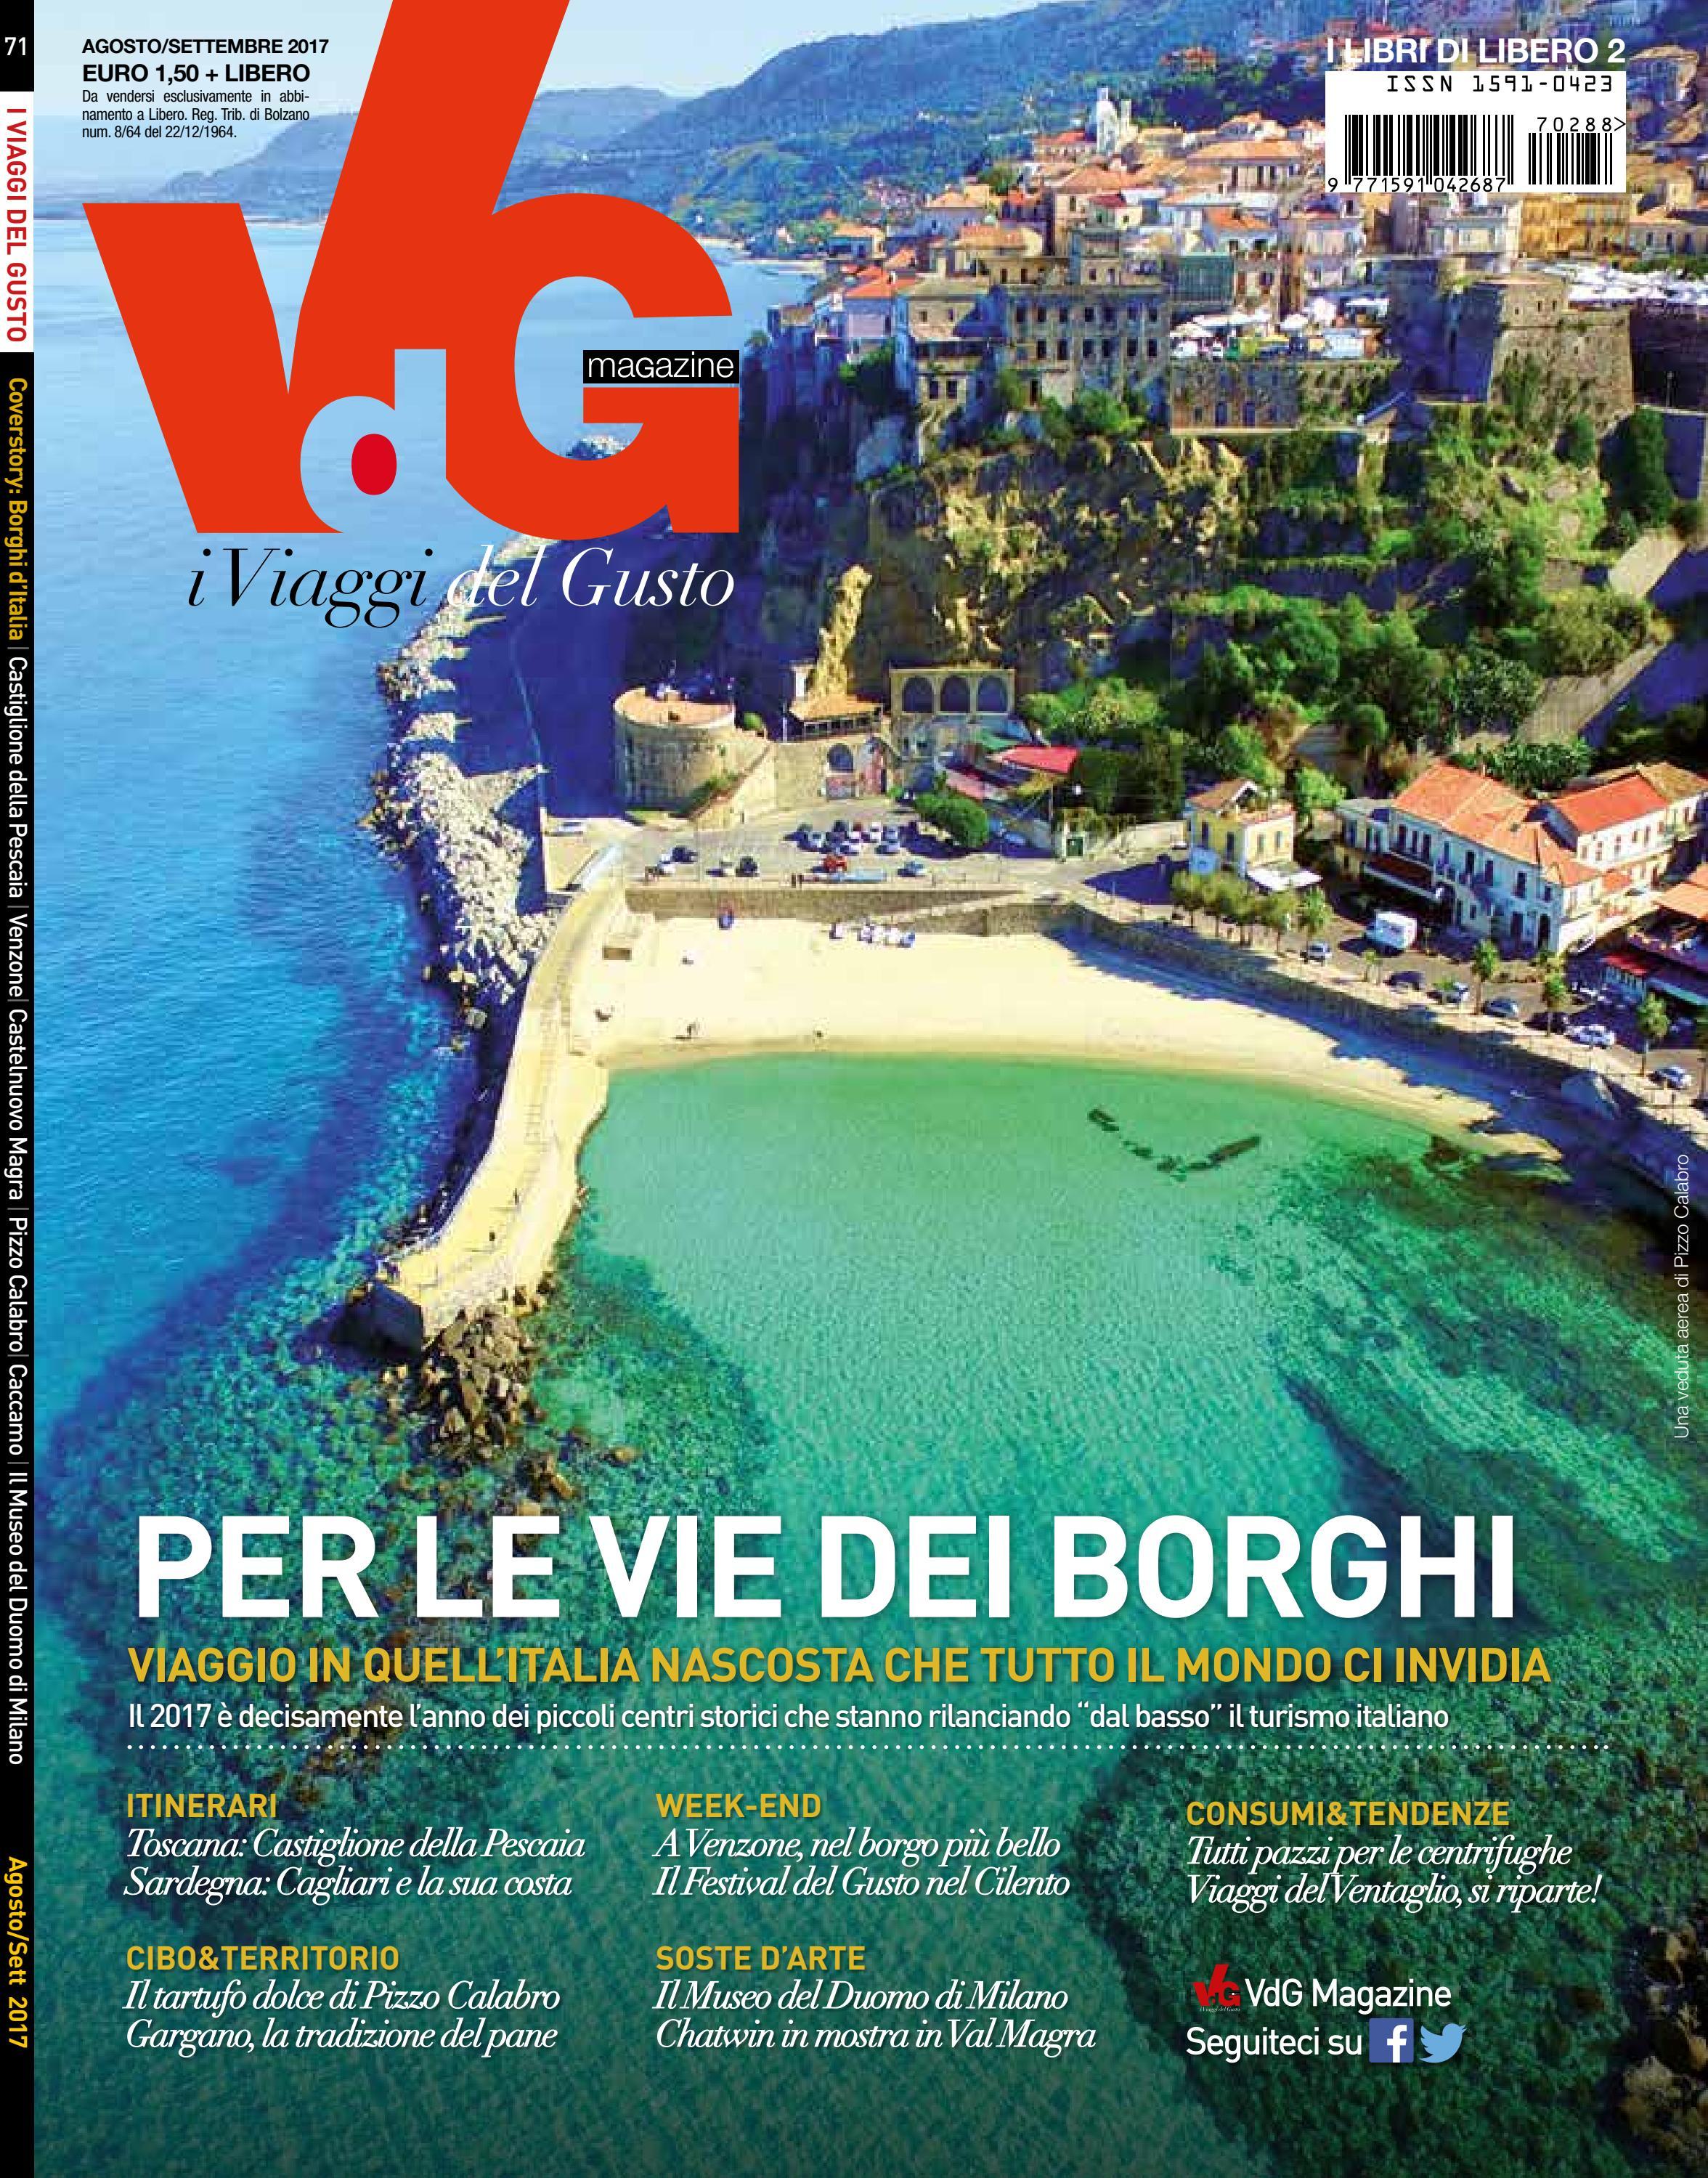 Vdg agosto settembre 2017 by vdgmagazine - issuu 8e1829170f5